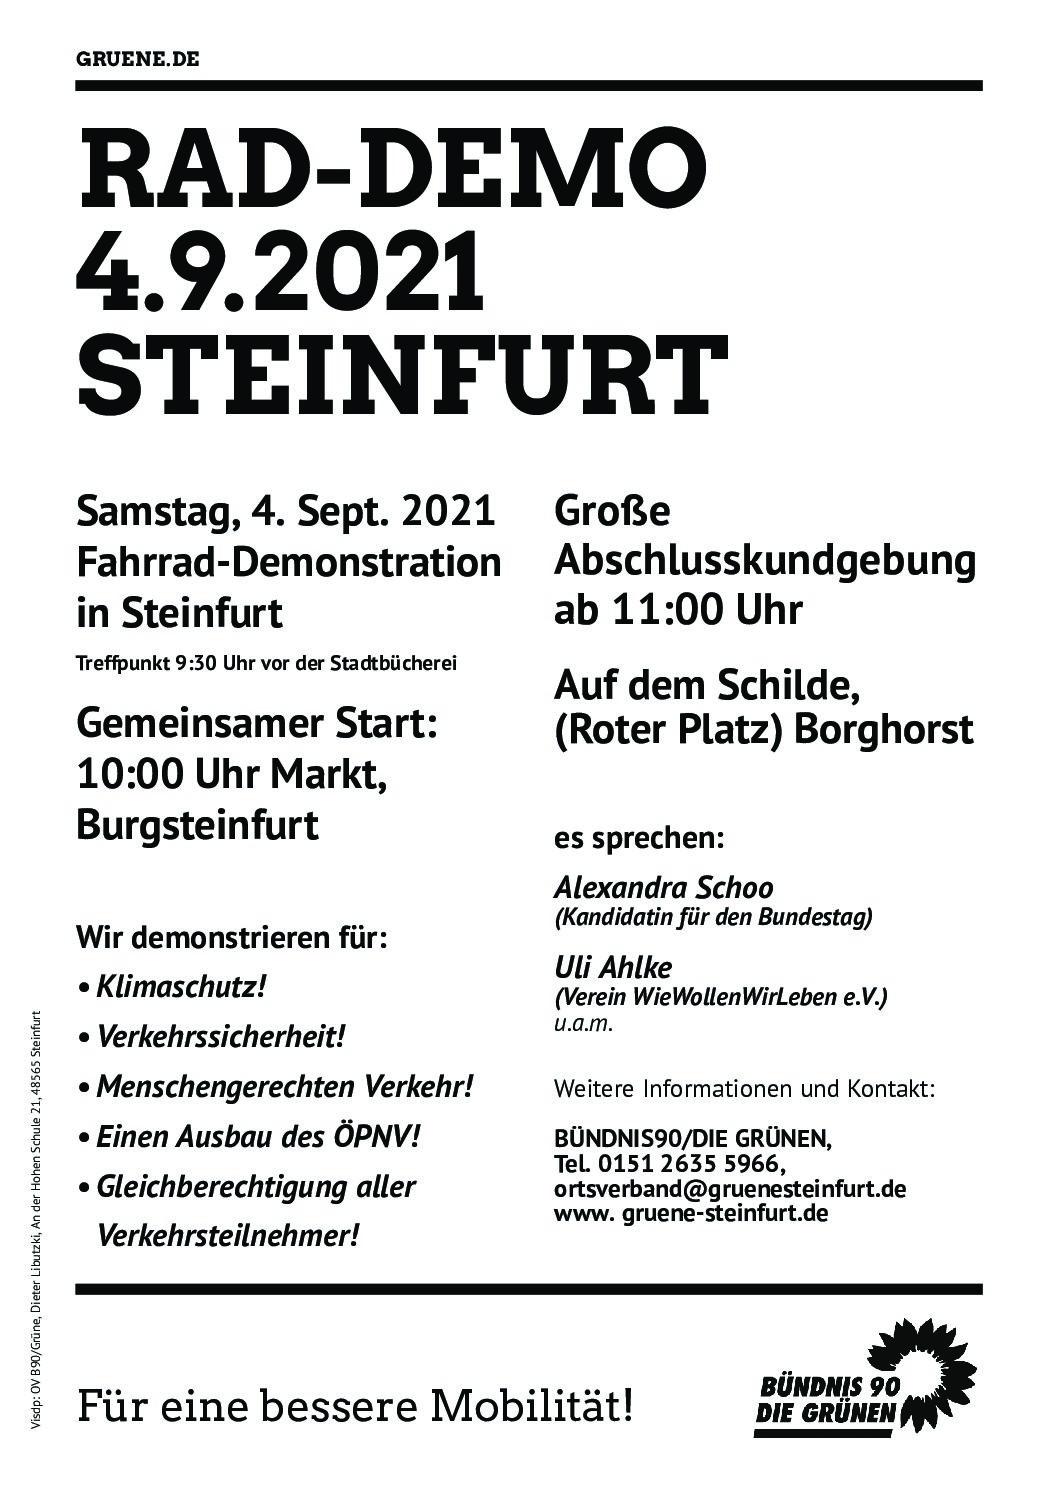 Save the date – 04.09.2021 Rad-Demo